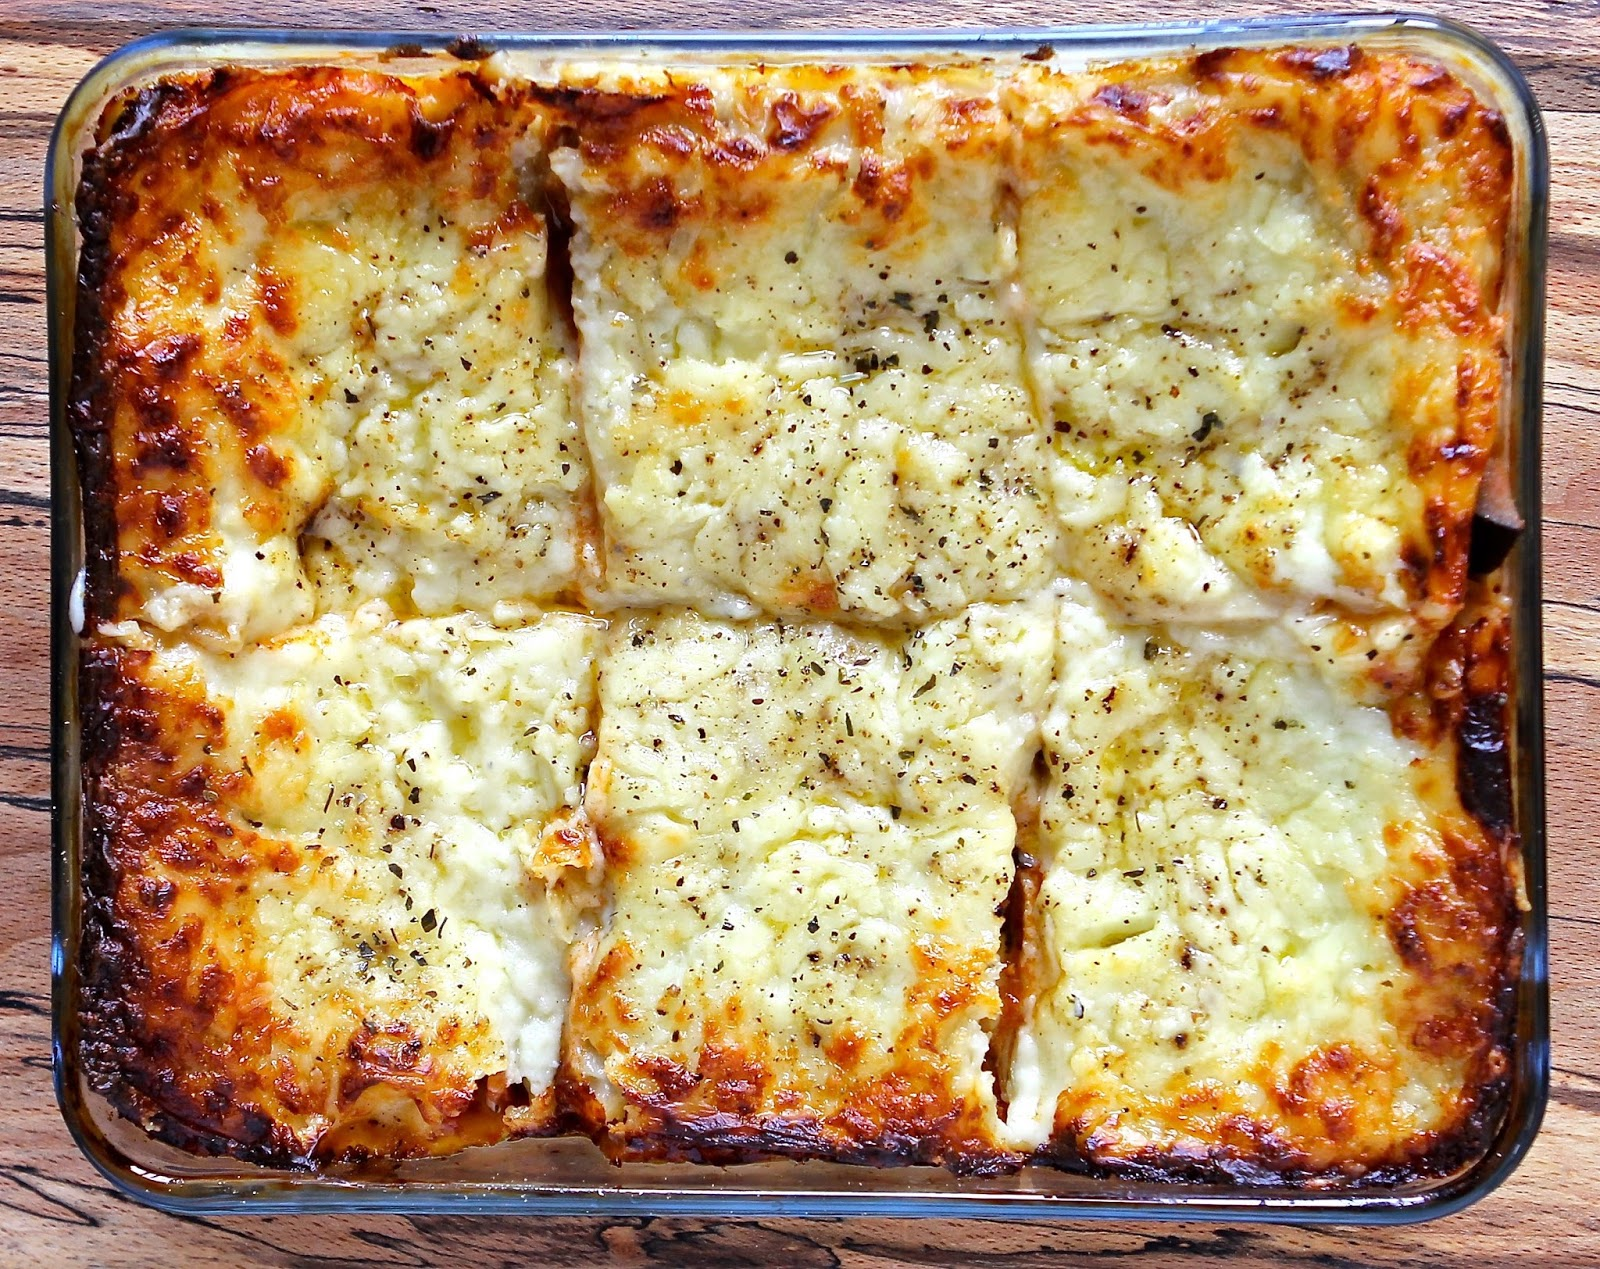 My Legendary Vegetable Lasagne Gluten Free Or Not As You Choose Gluten Free Alchemist